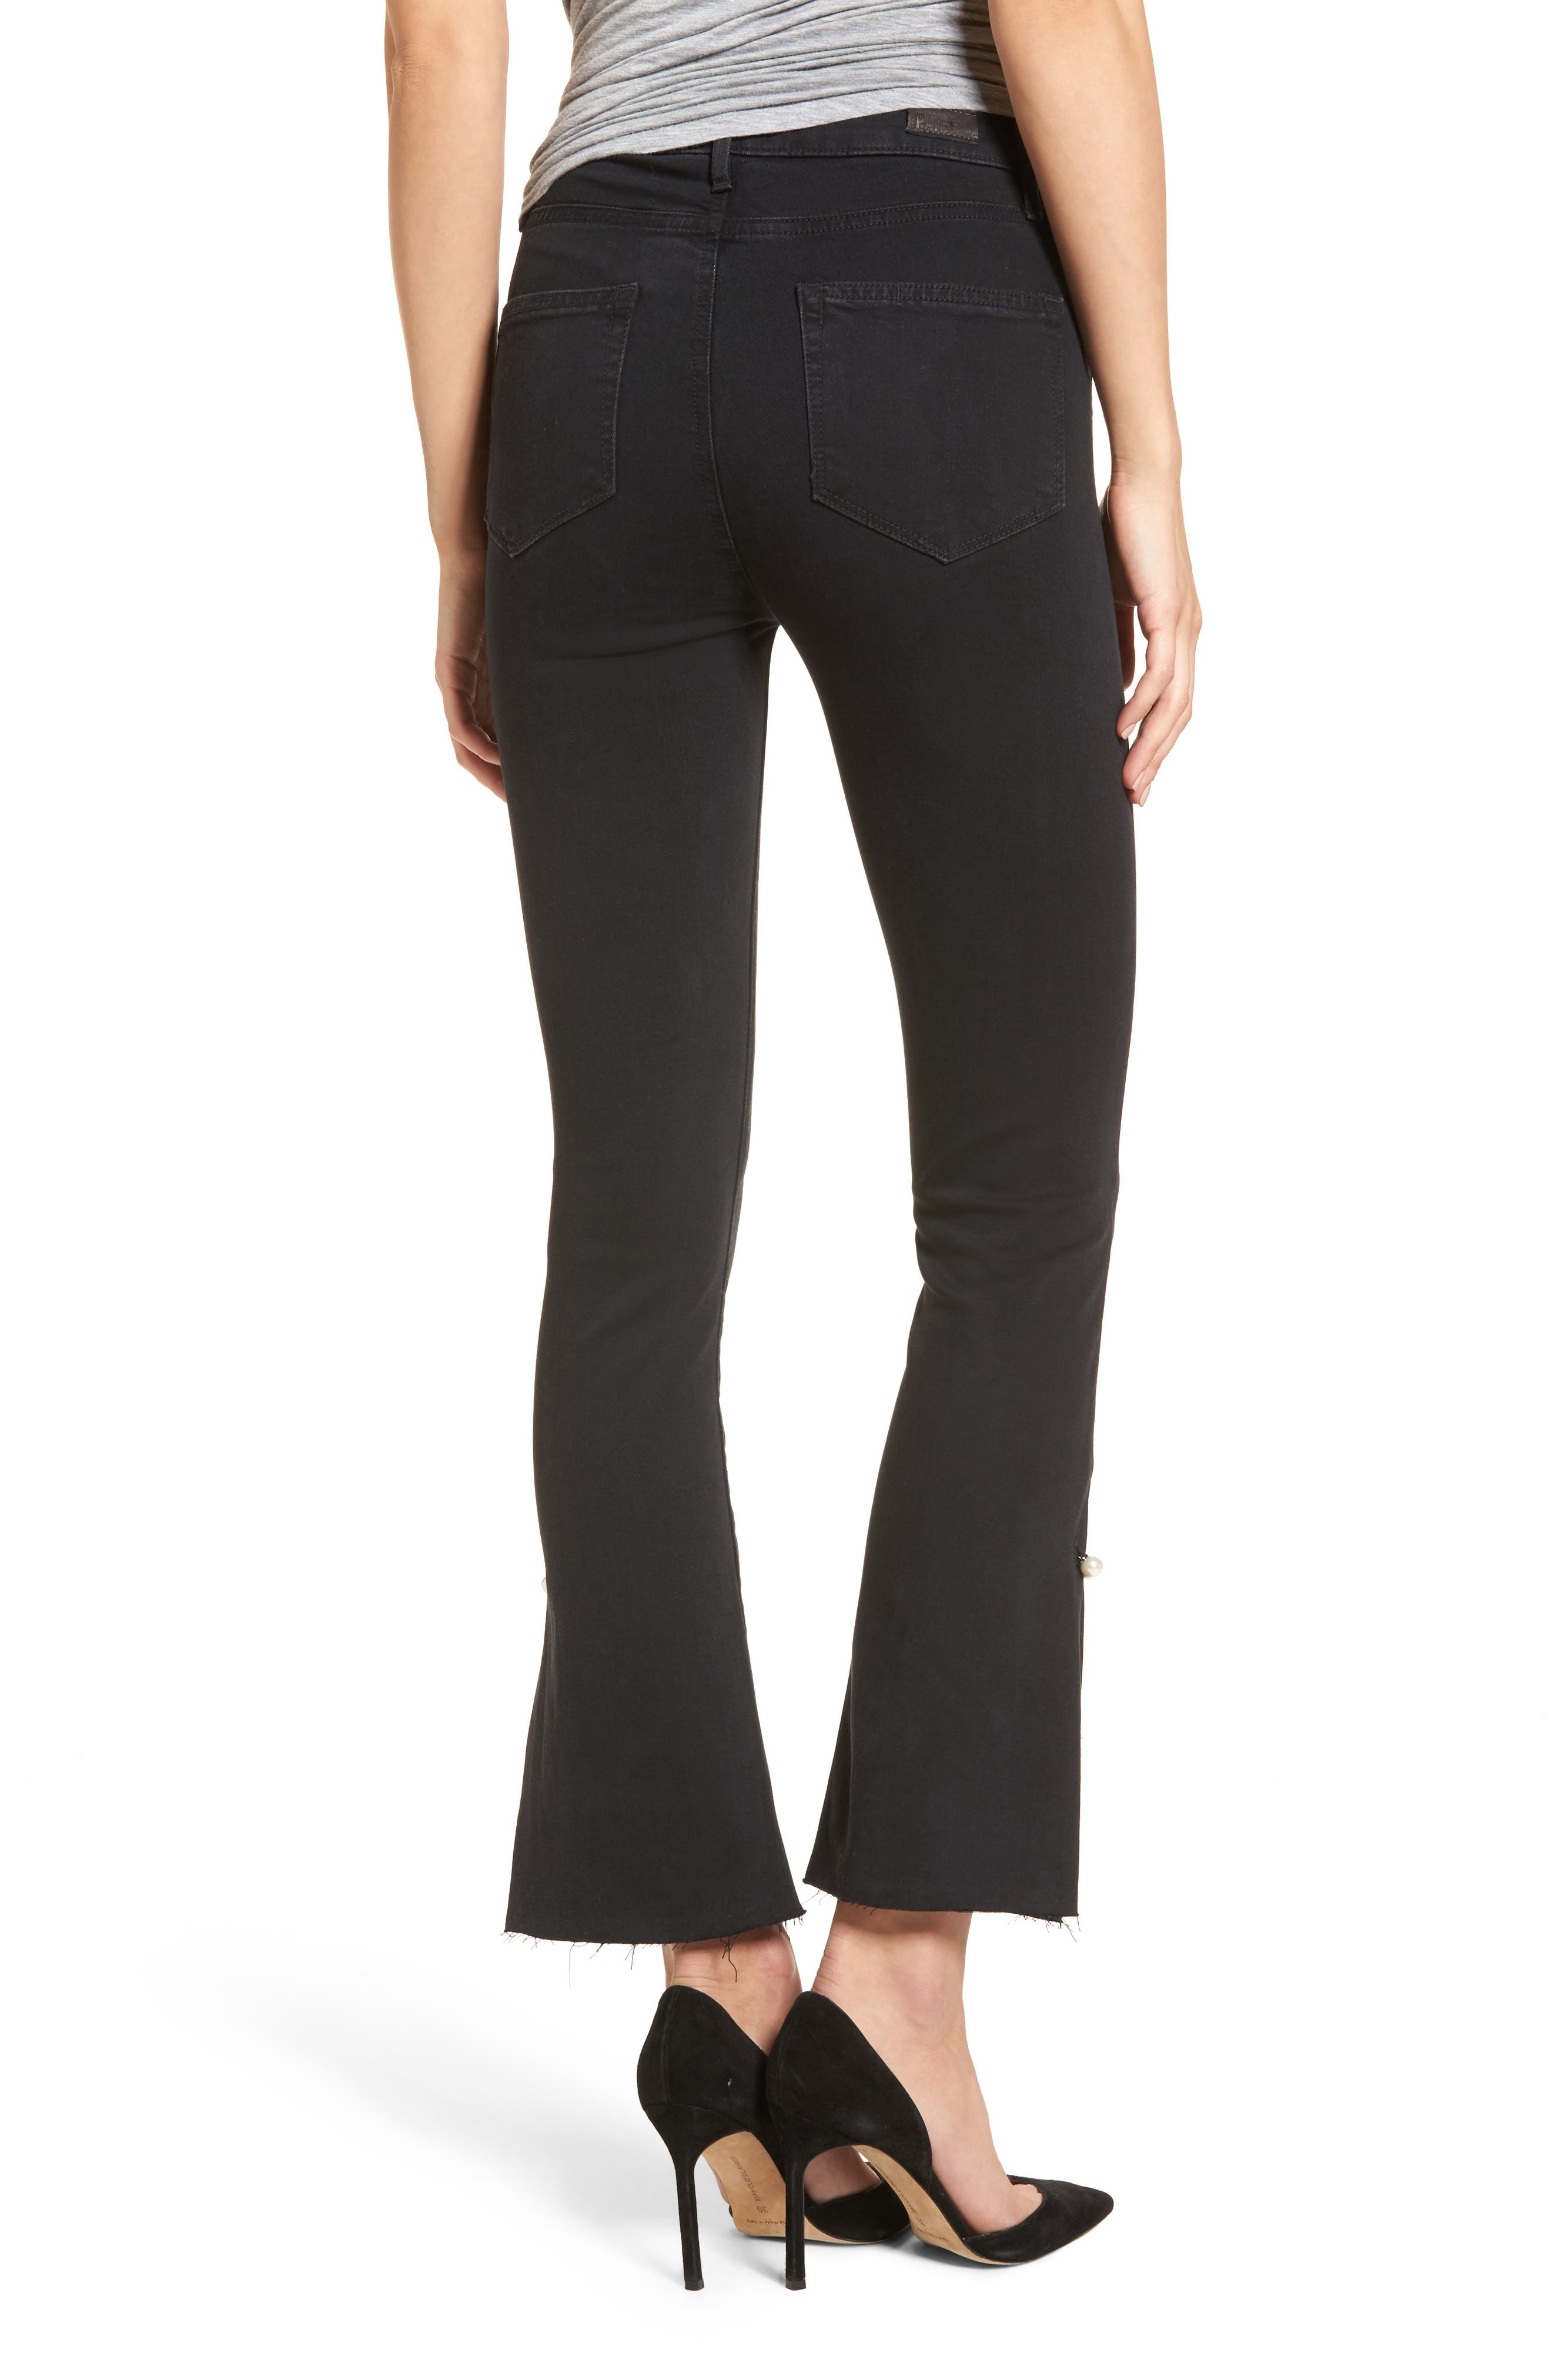 Alternate Image 2  - PAIGE Transcend - Colette High Waist Crop Flare Jeans (Bandit)